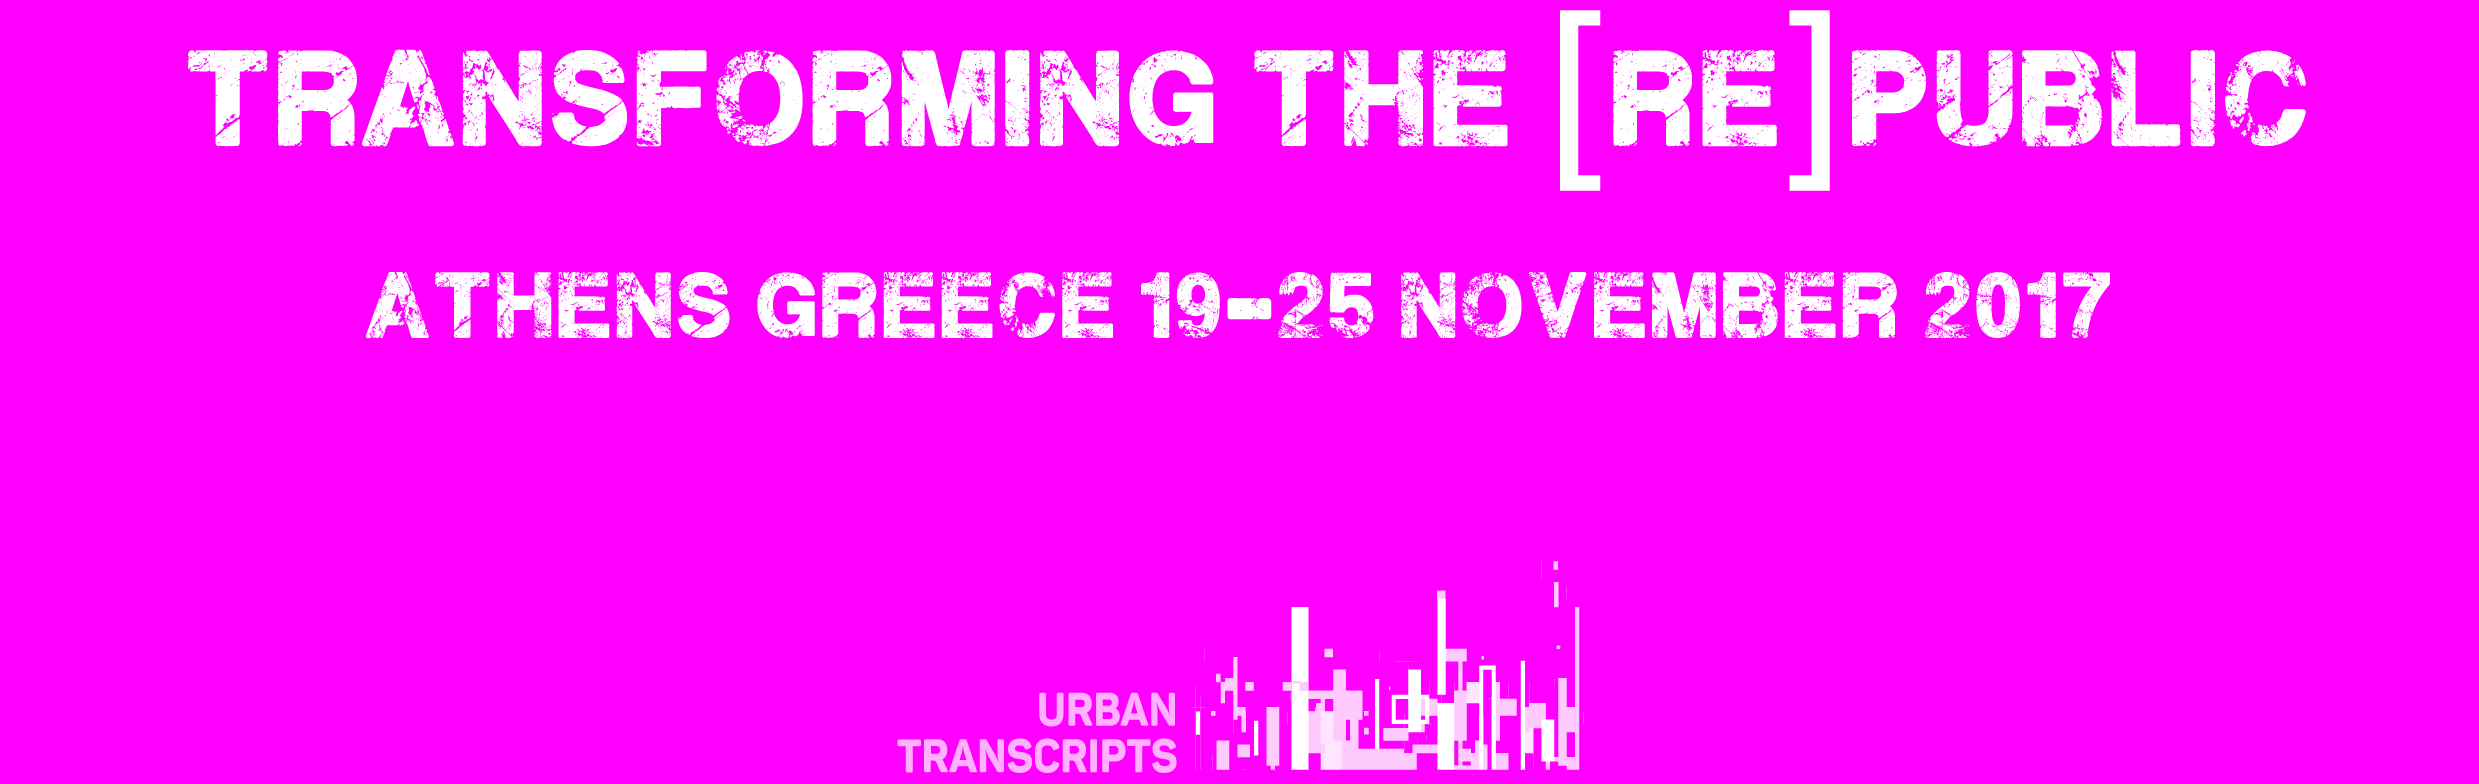 Transforming the [re]public – An Urban Laboratory on Public